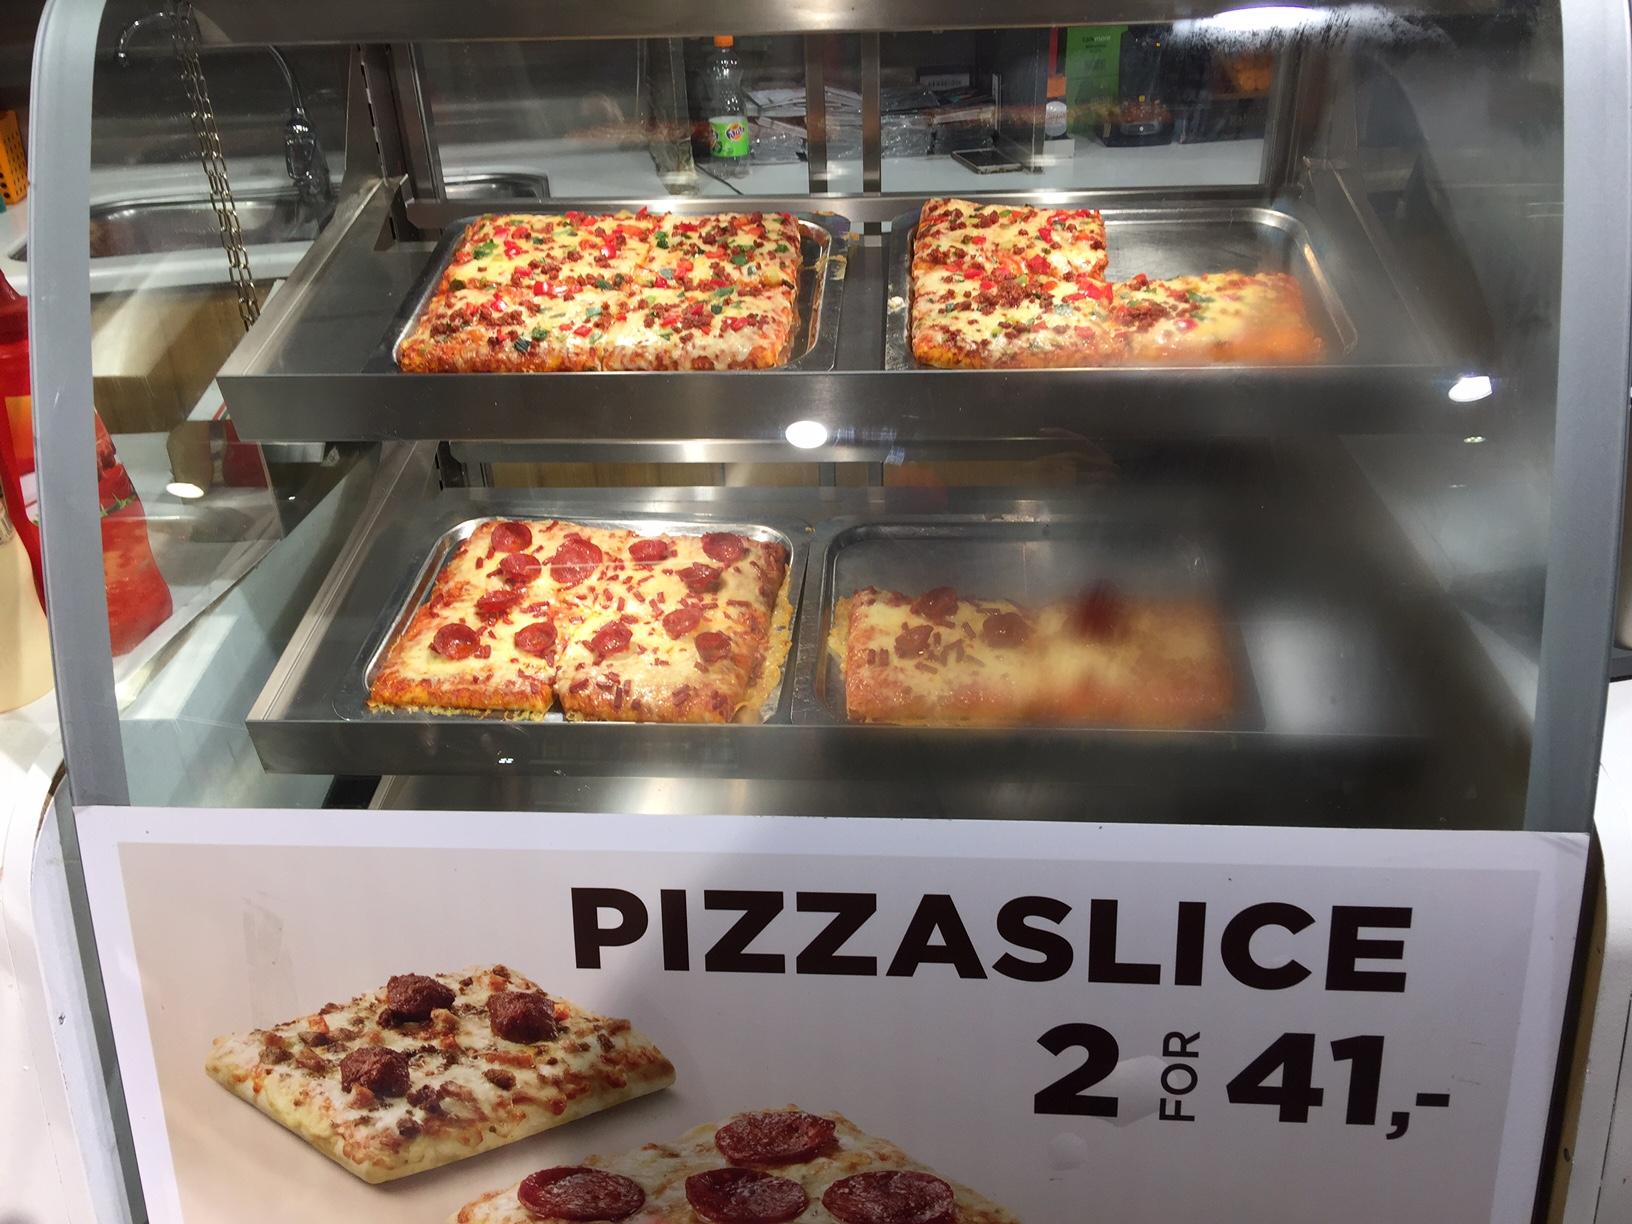 Pizza in case